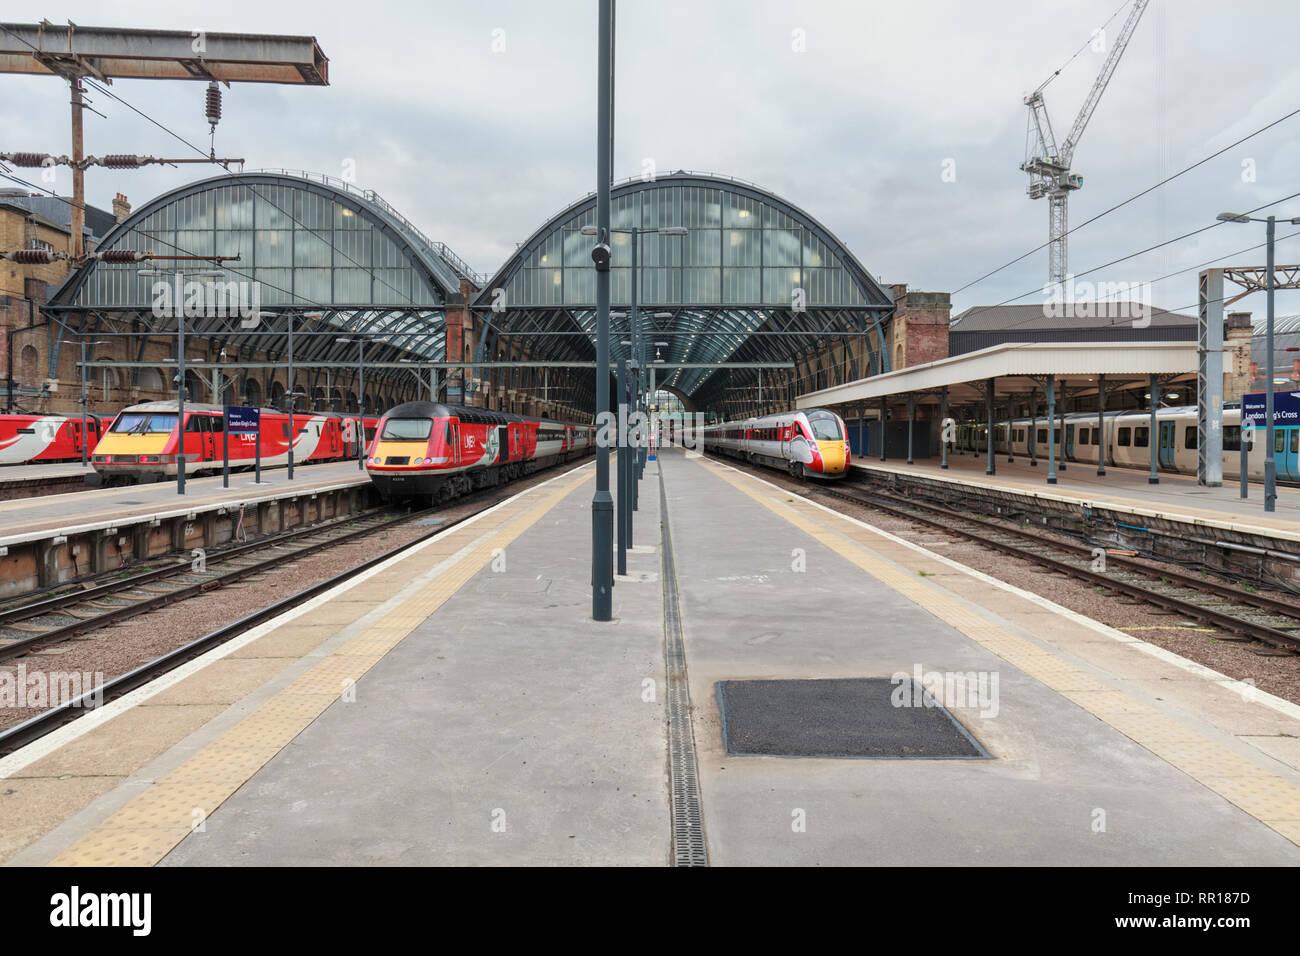 London North Eastern Railway ( LNER ) Intercity 125, class 91 electrics, and brand new Azuma train at London Kings cross station - Stock Image